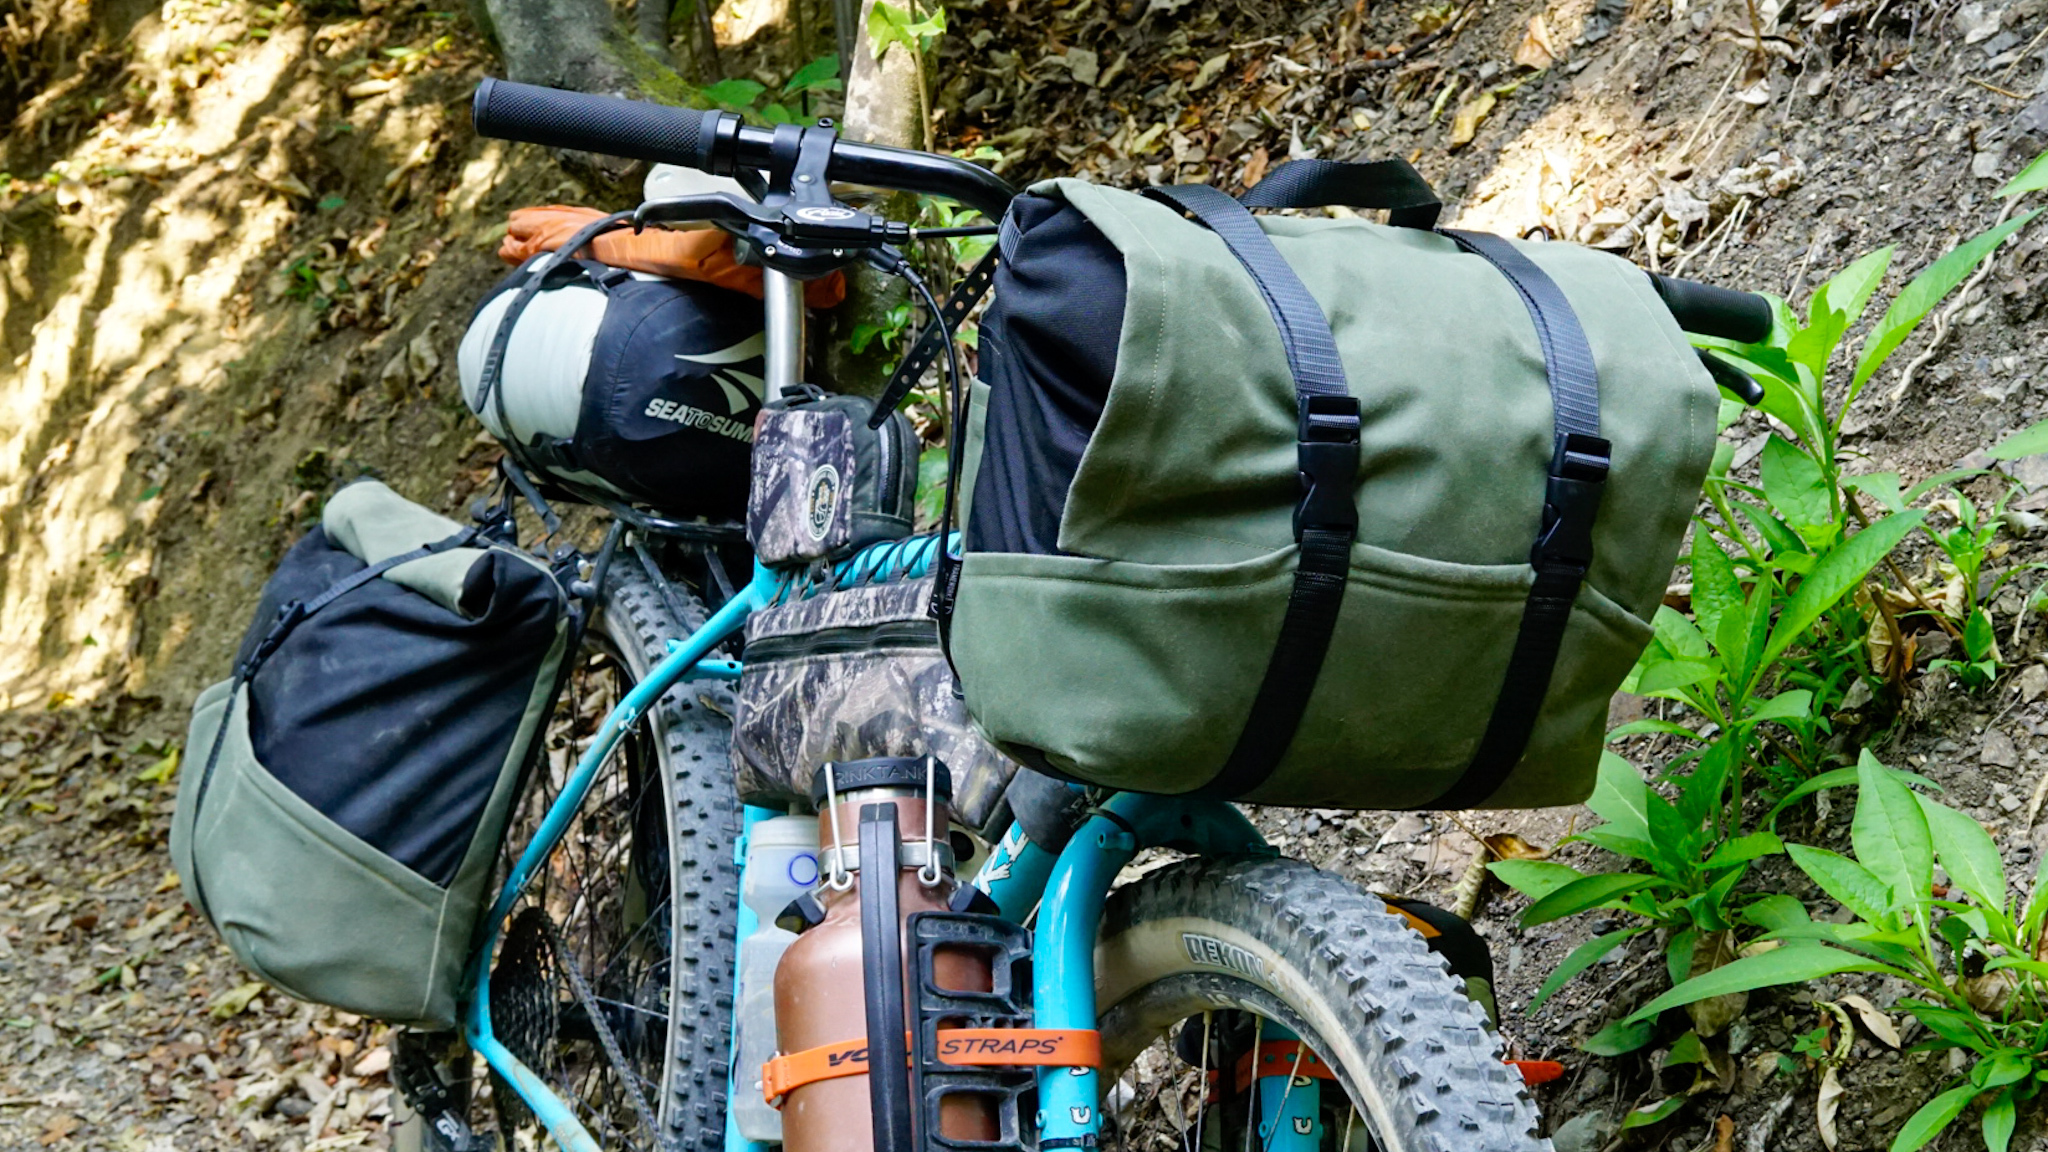 Framework Designs overlander bikepacking handlebar bag and custom panniers